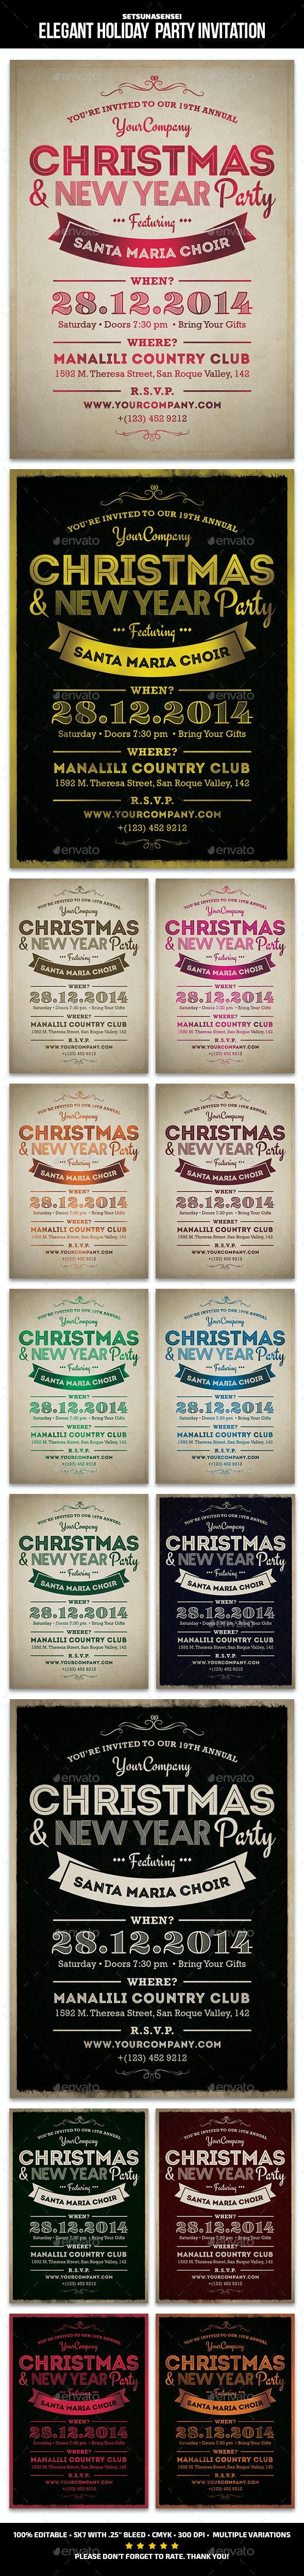 Elegant Holiday Party Invitation - Invitations Cards & Invites